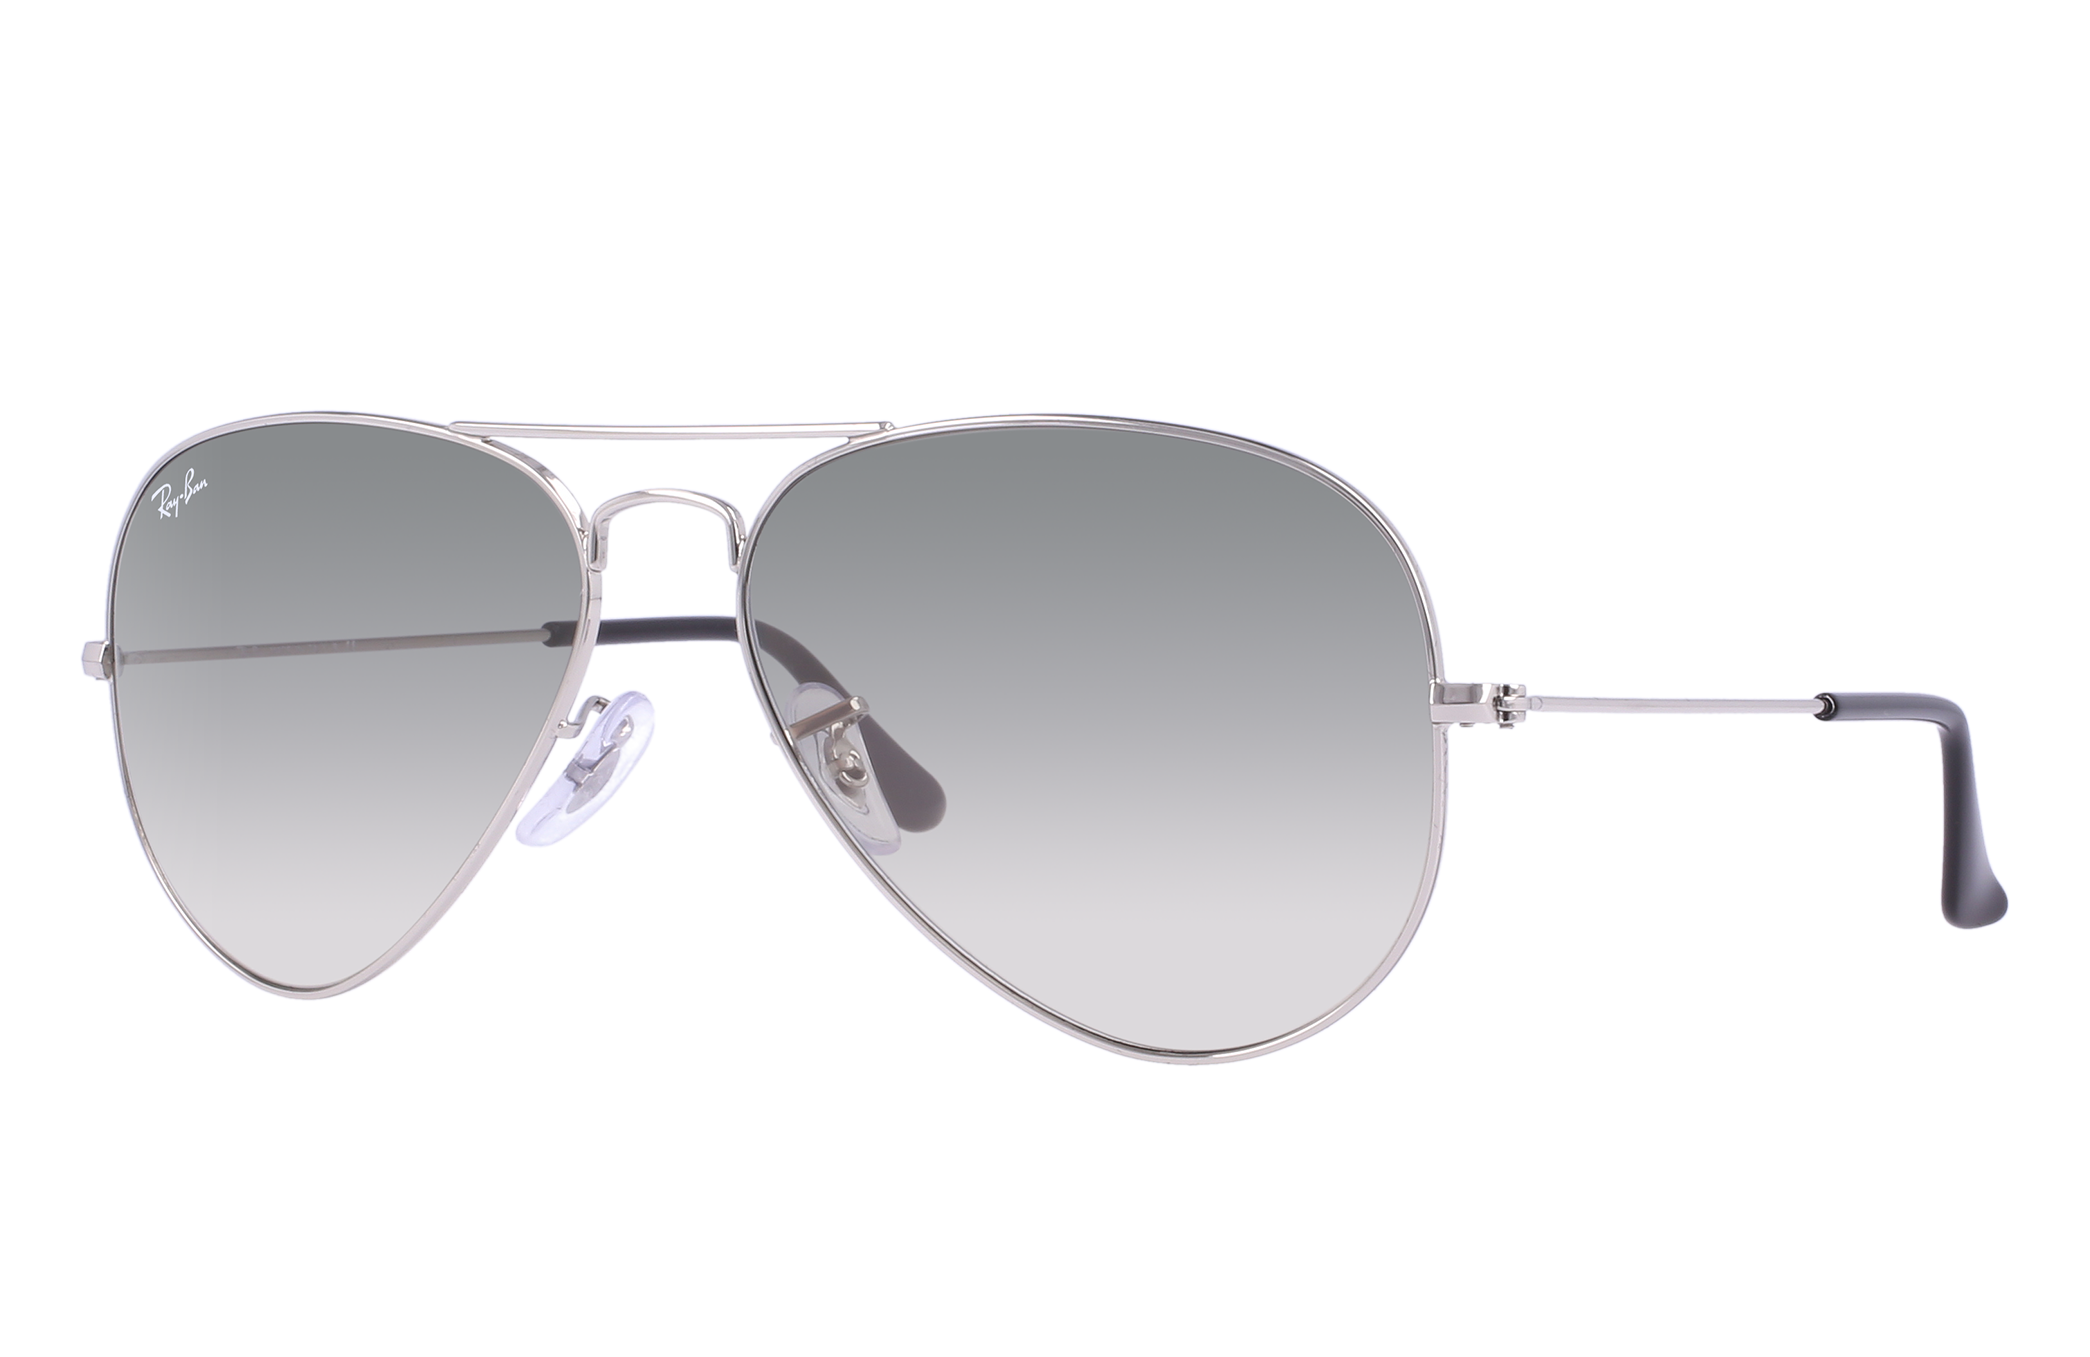 Ray-Ban Aviator Gradient Silver, Gray Lenses - RB3025